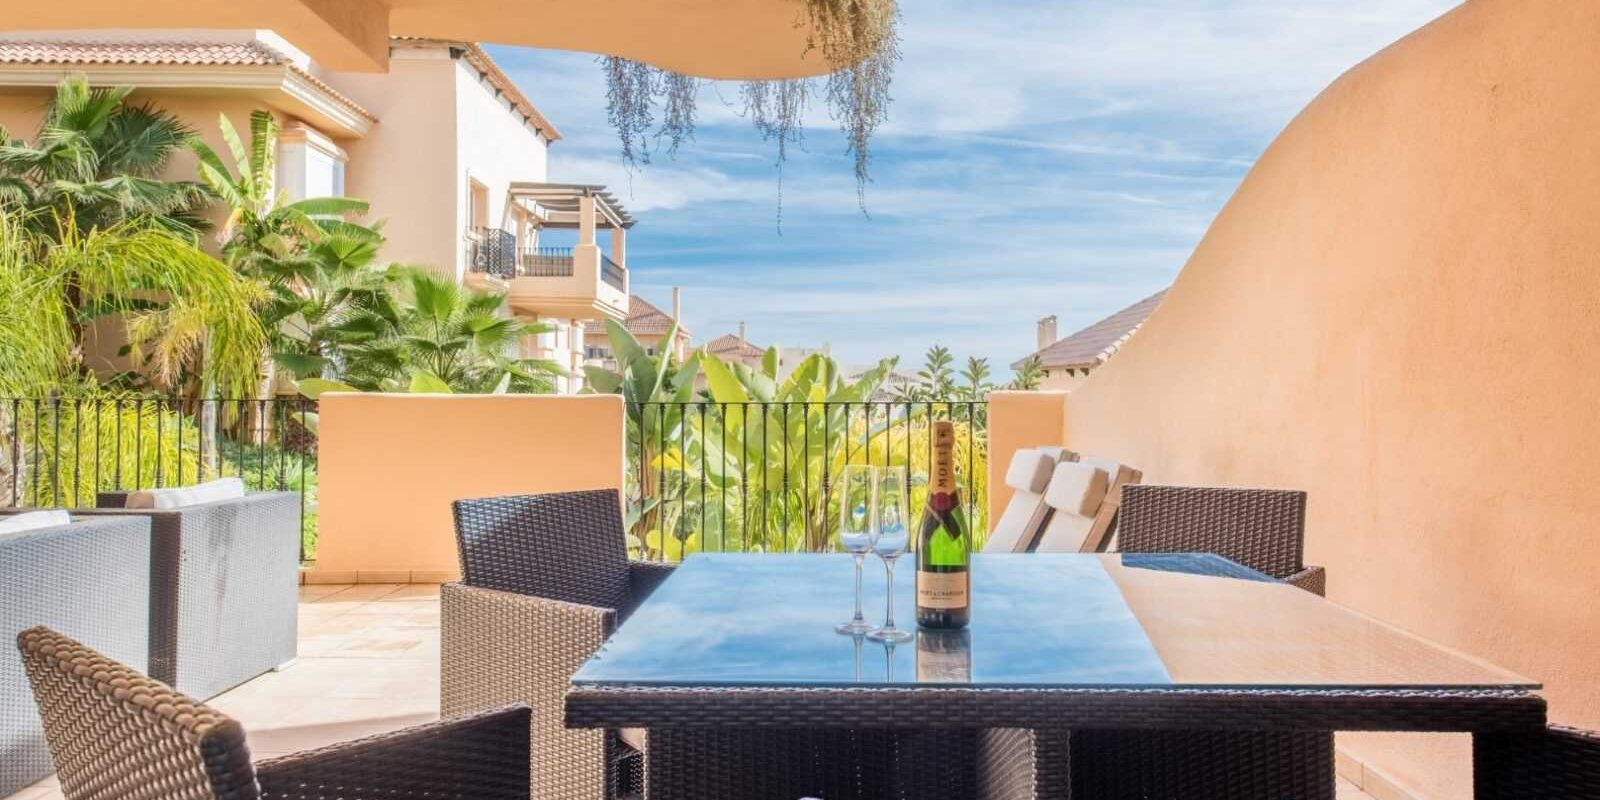 Web_ec_SEP_Aloha_Hill_Club_Apartment_MiMove_01 (Large)